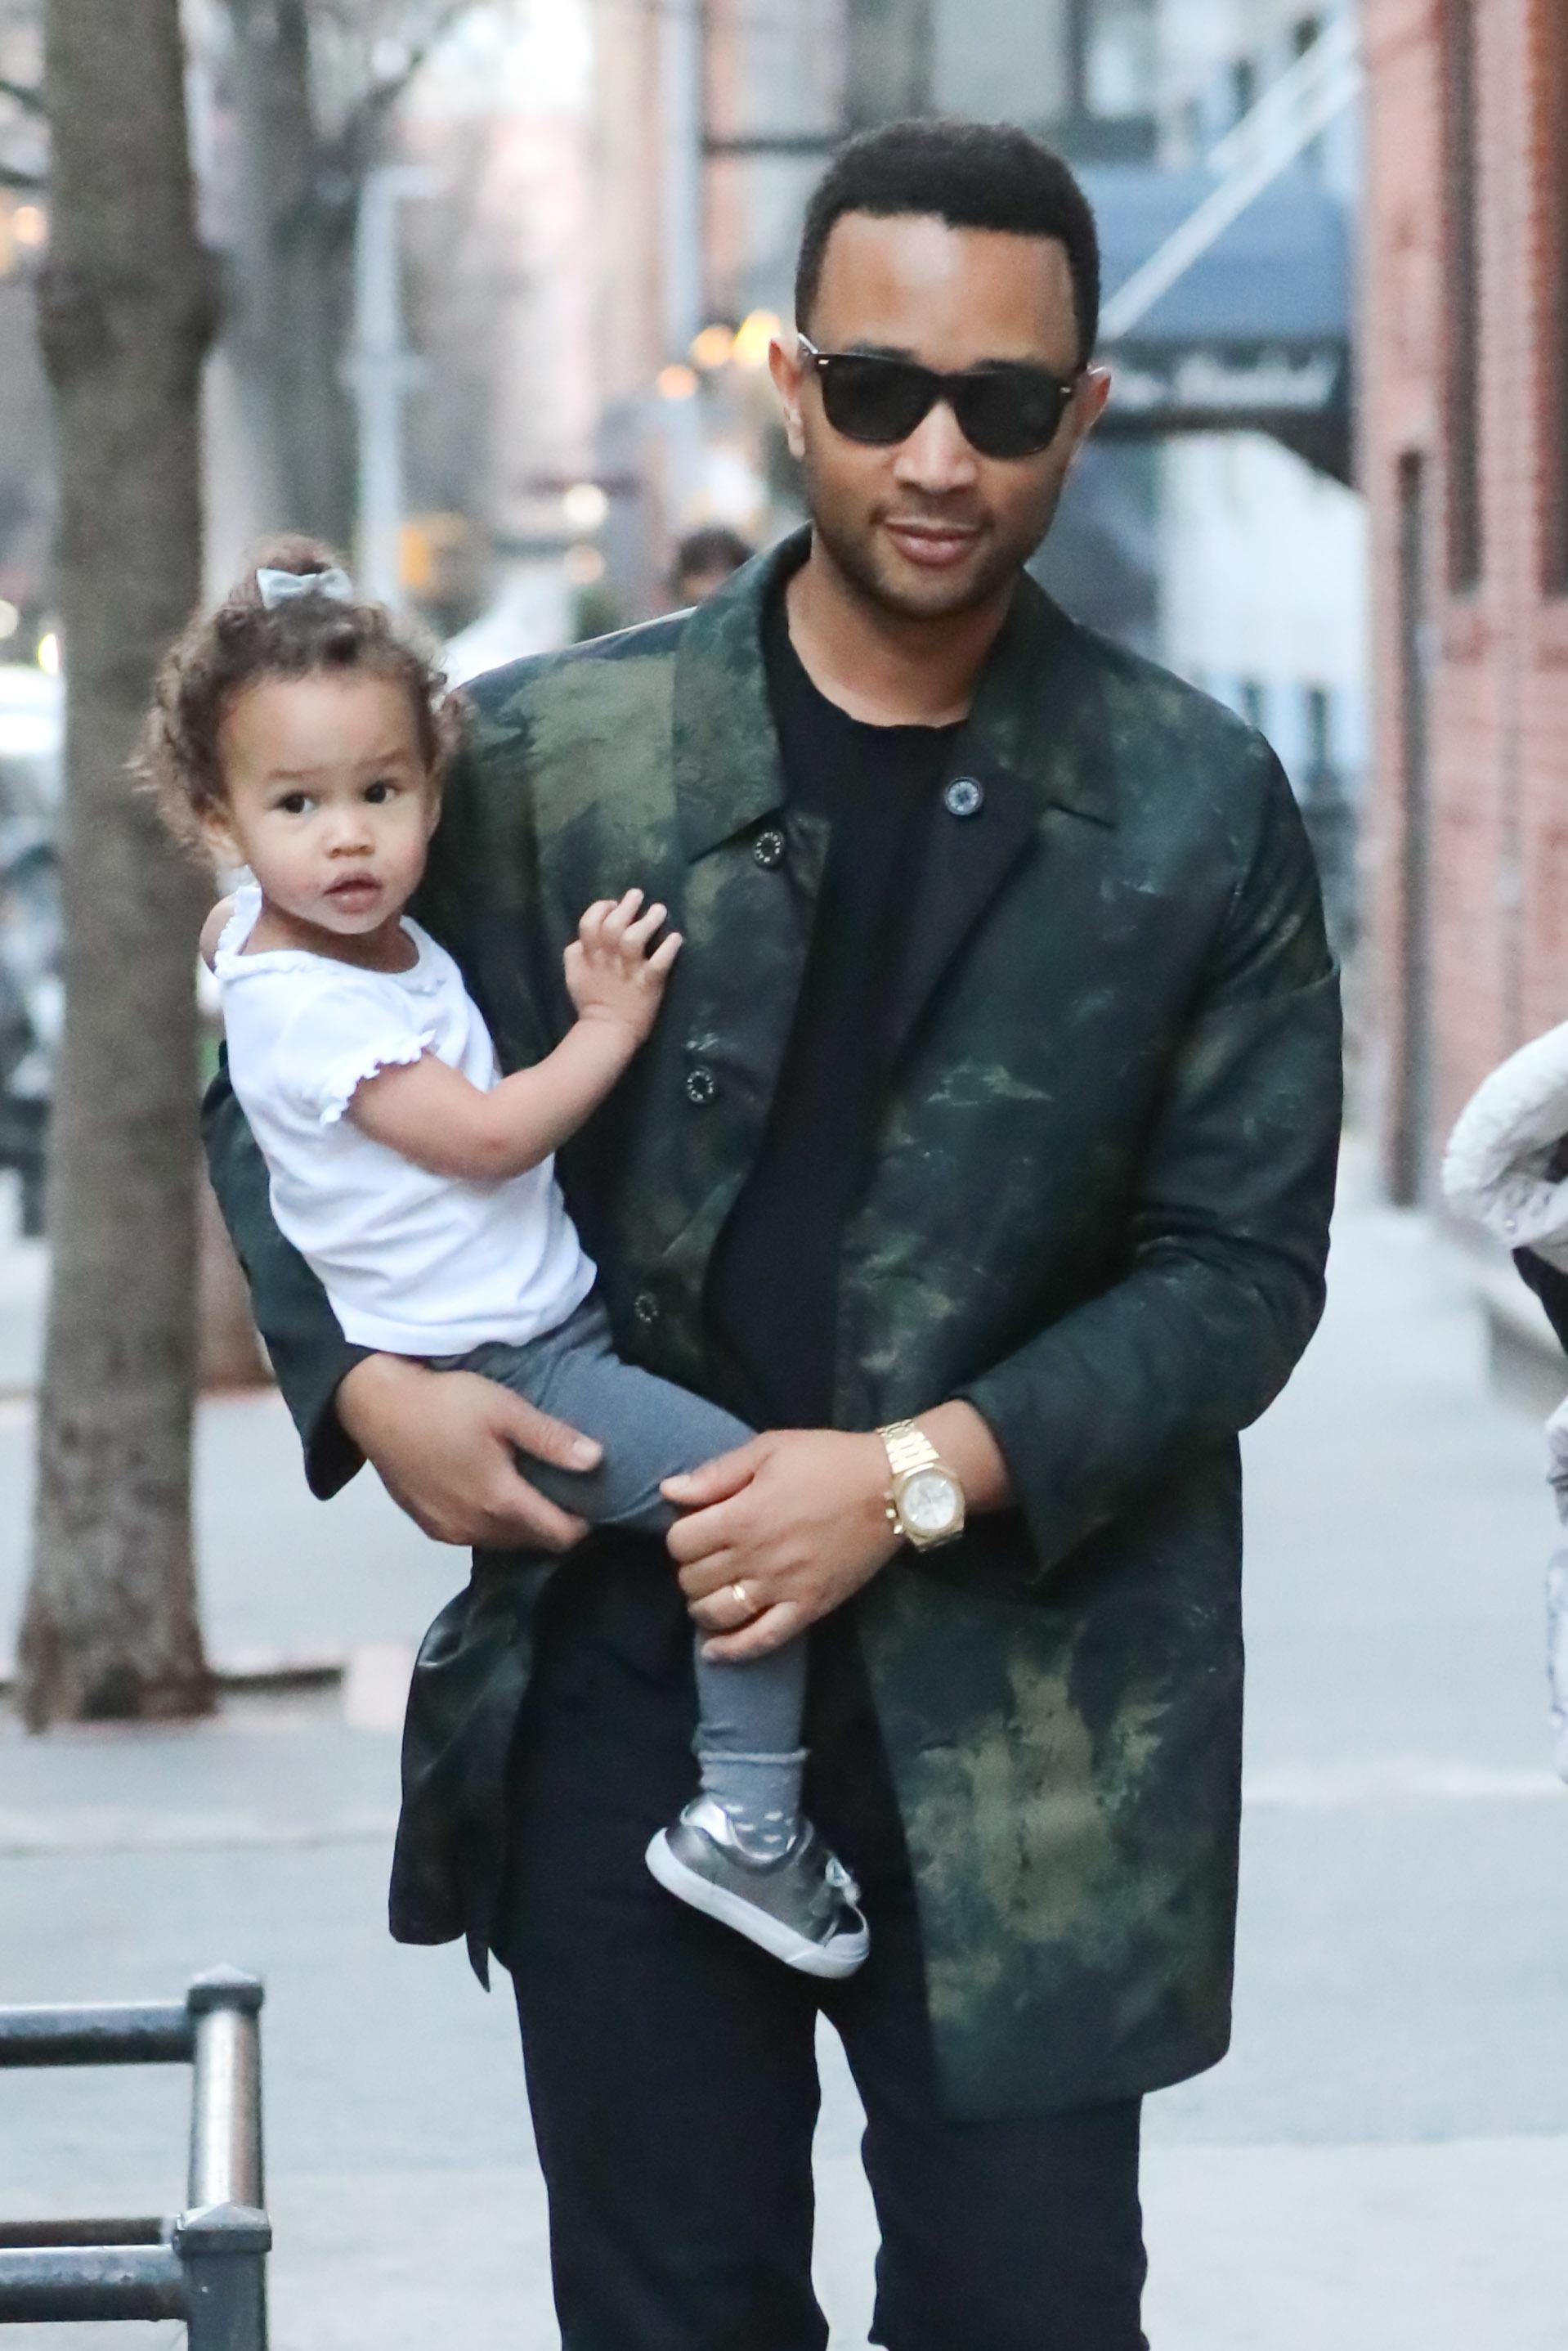 John Legend carries daughter Luna Stephens in New York City on Feb. 20, 2018.